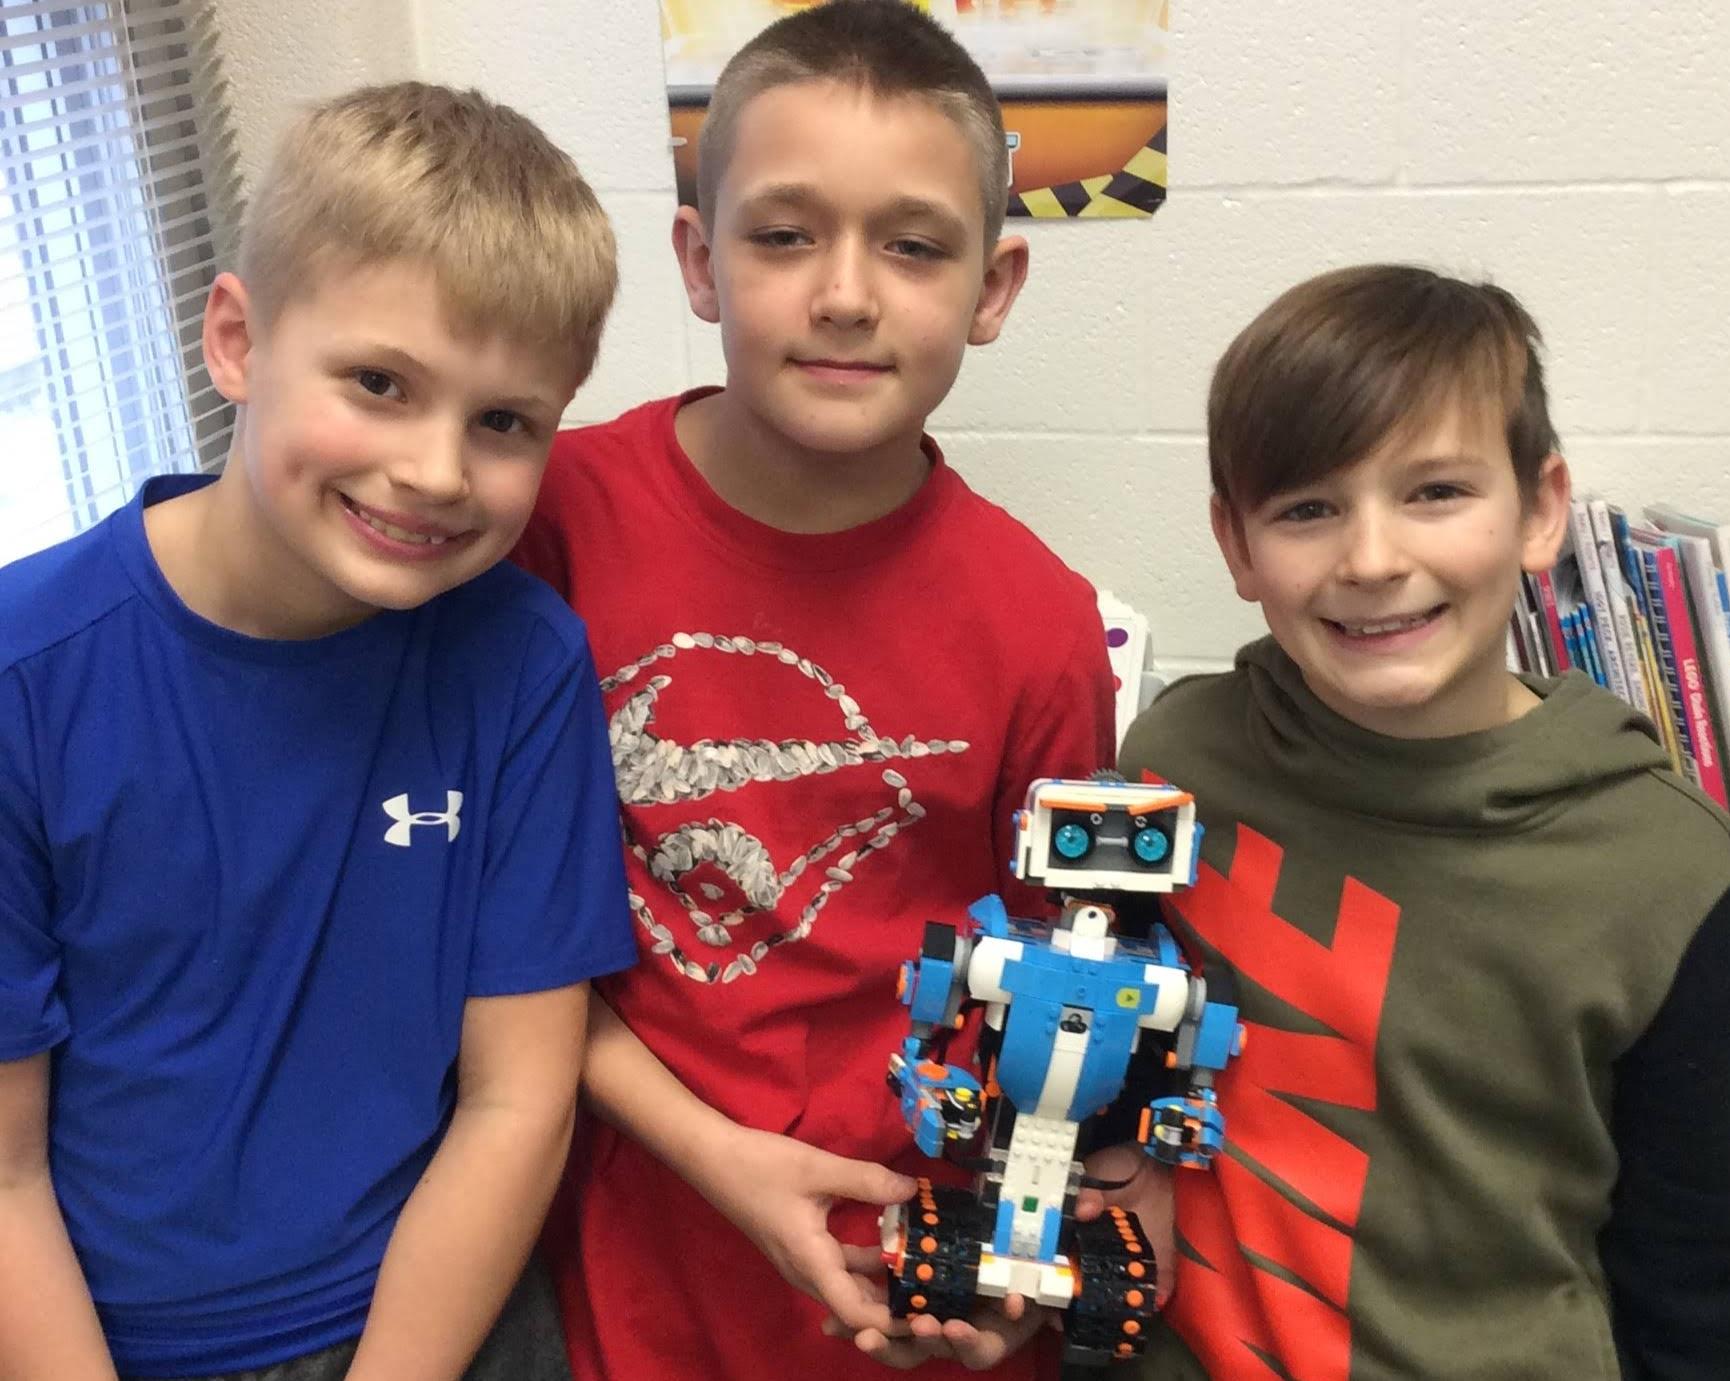 robotics with fourth graders